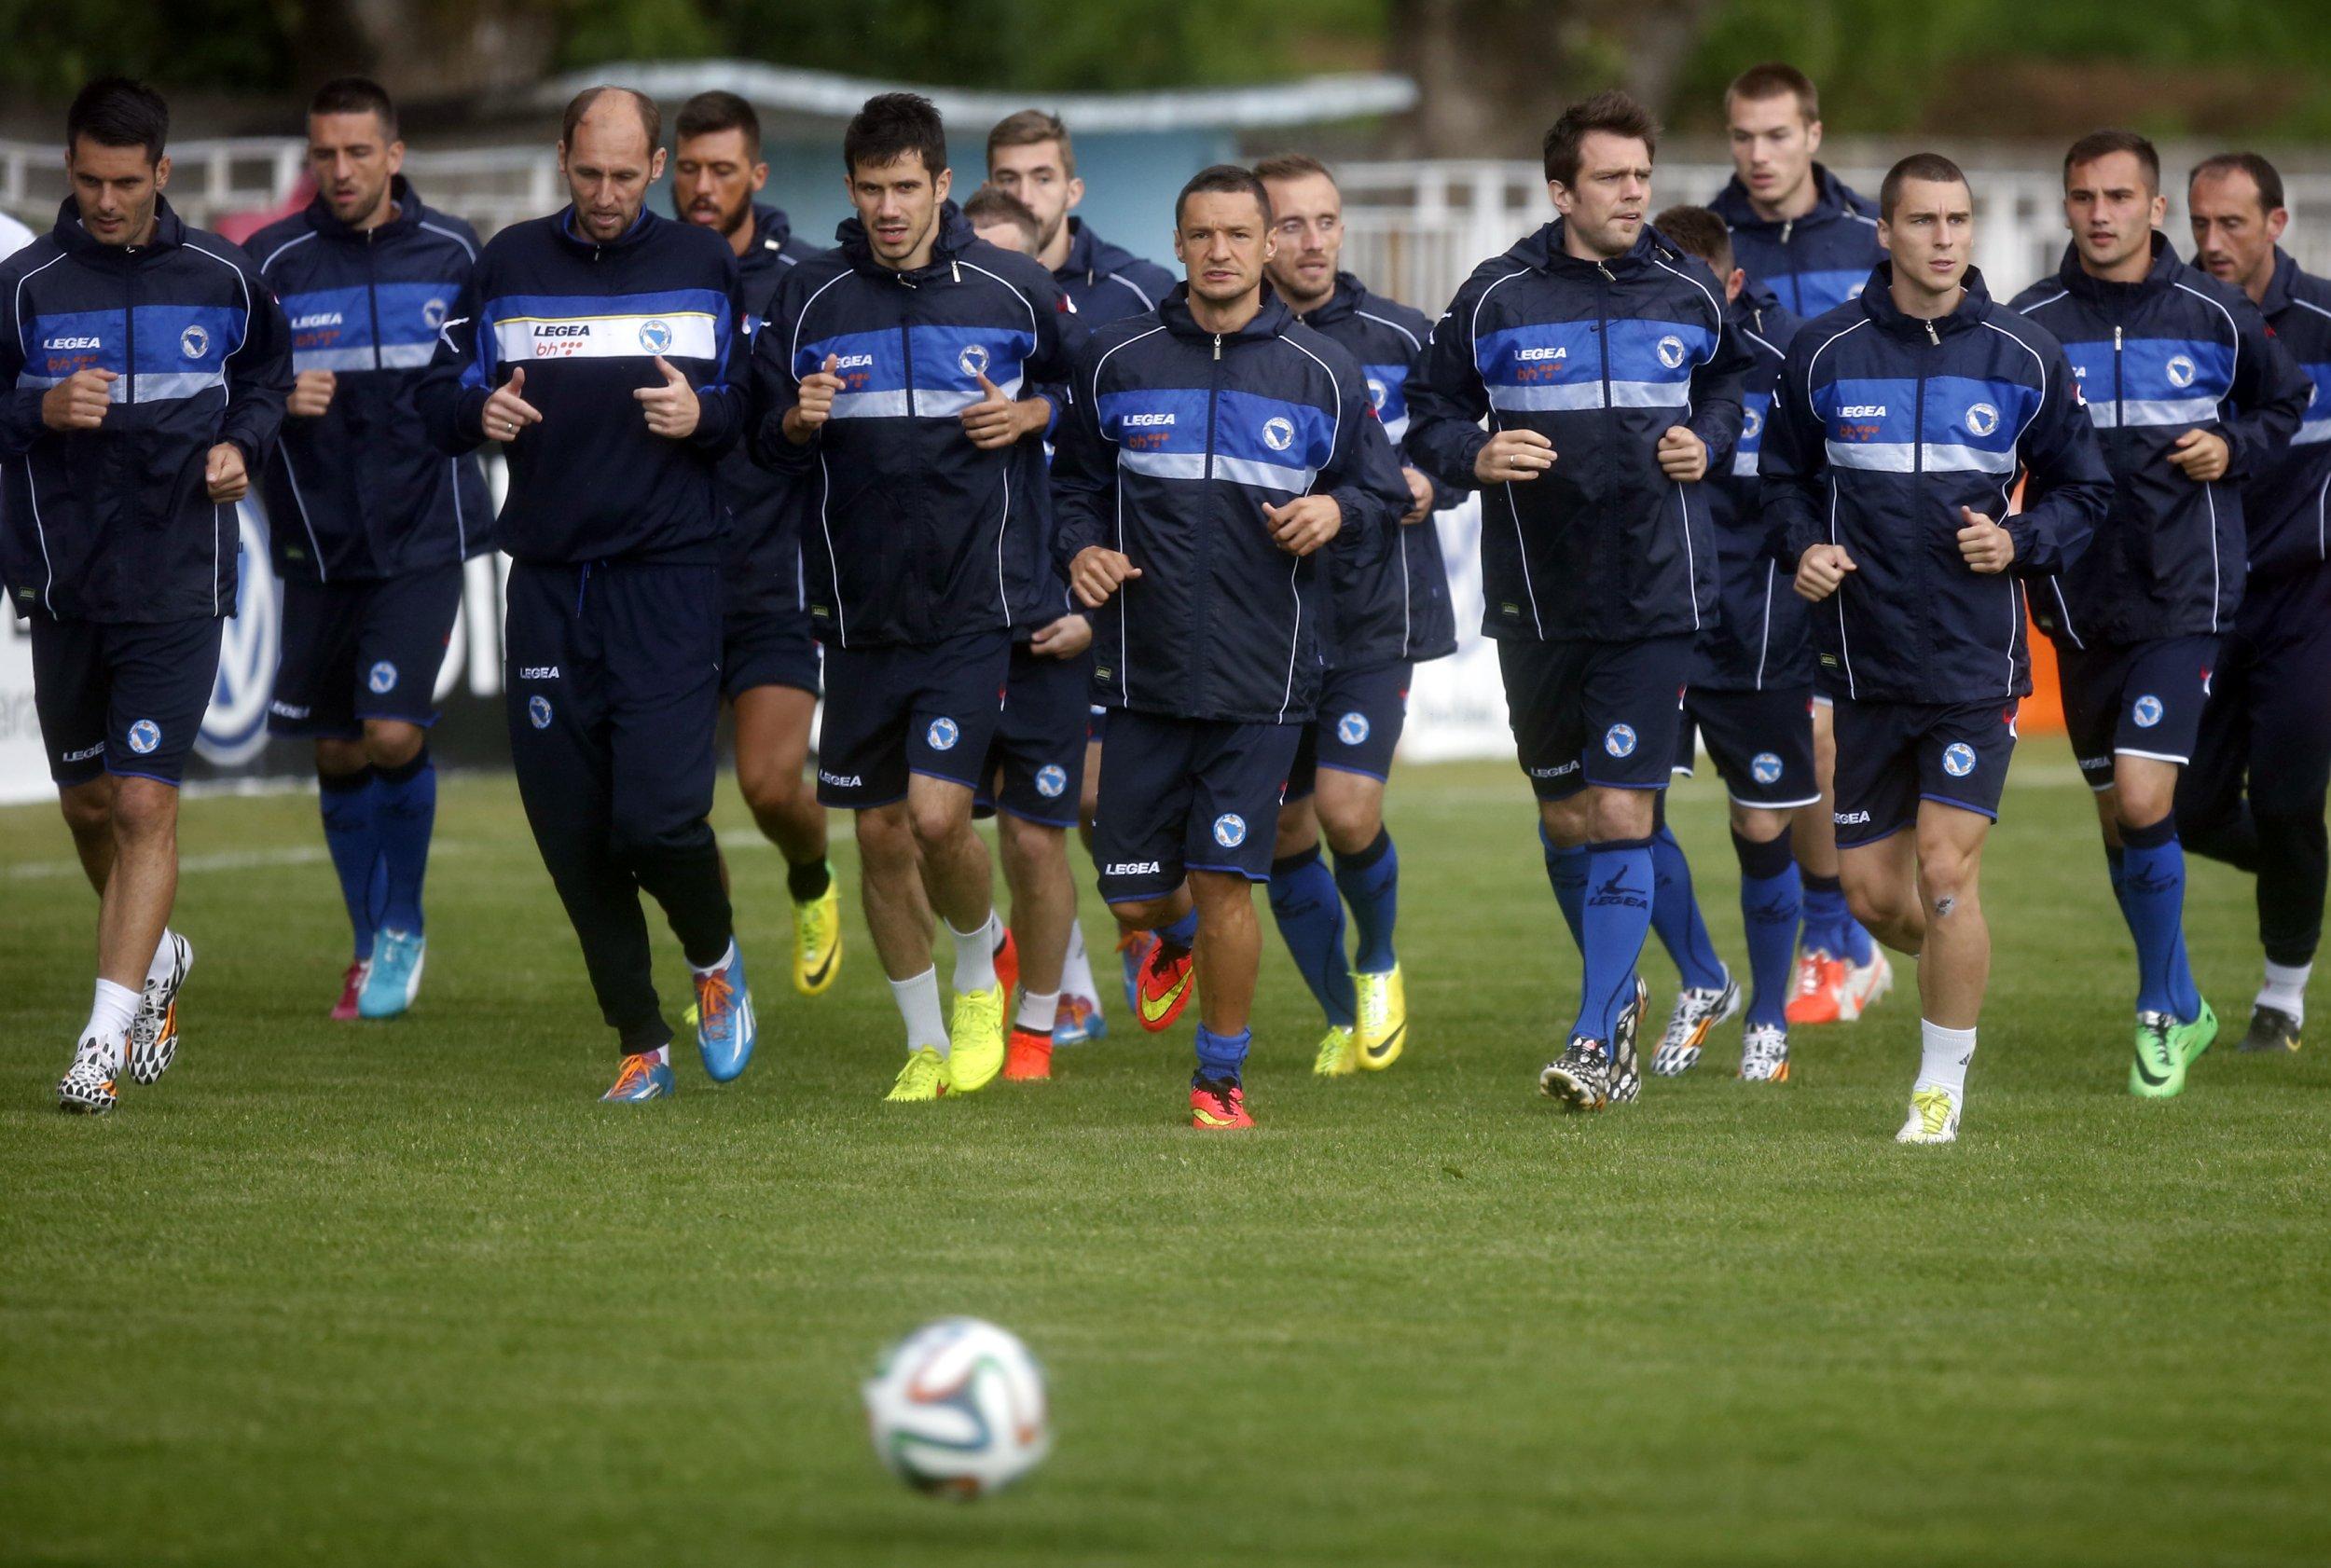 Bosnia national soccer team